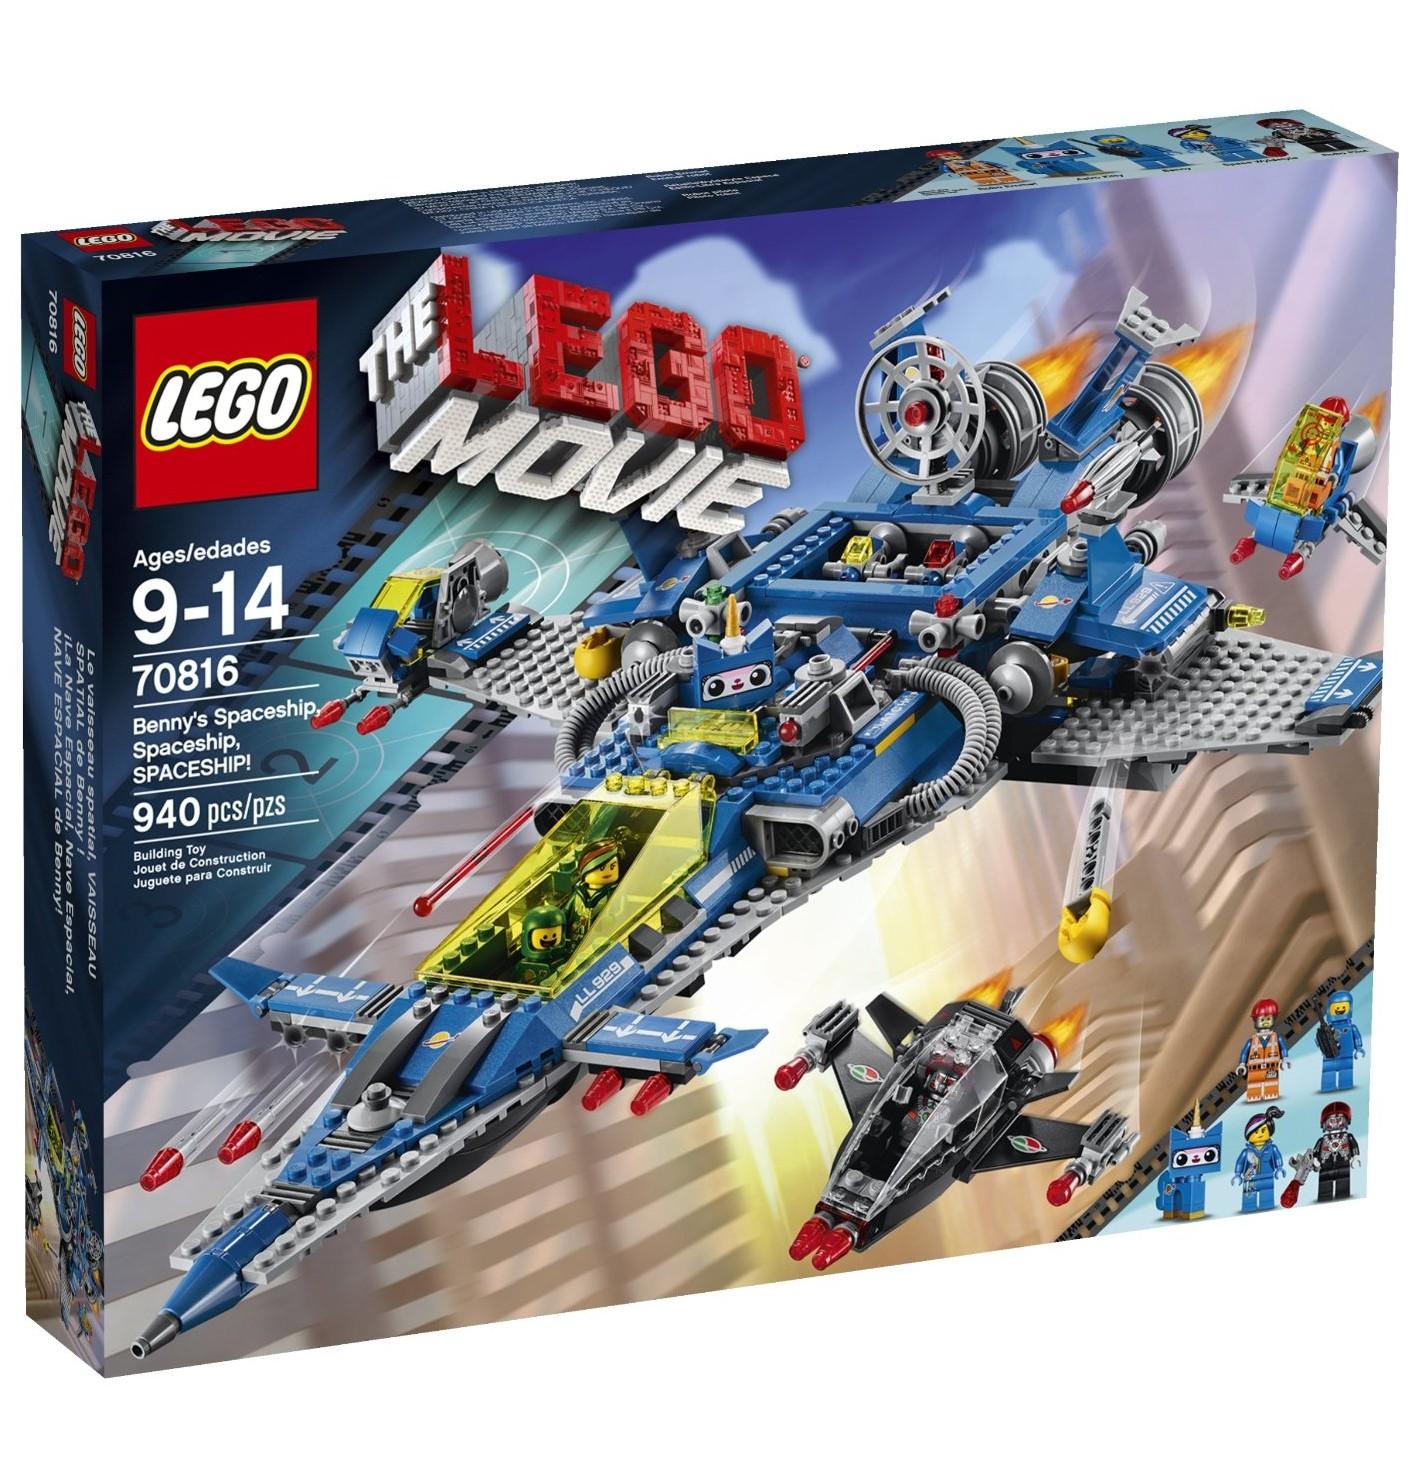 lego movie benny 39 s spaceship spaceship spaceship 70816. Black Bedroom Furniture Sets. Home Design Ideas